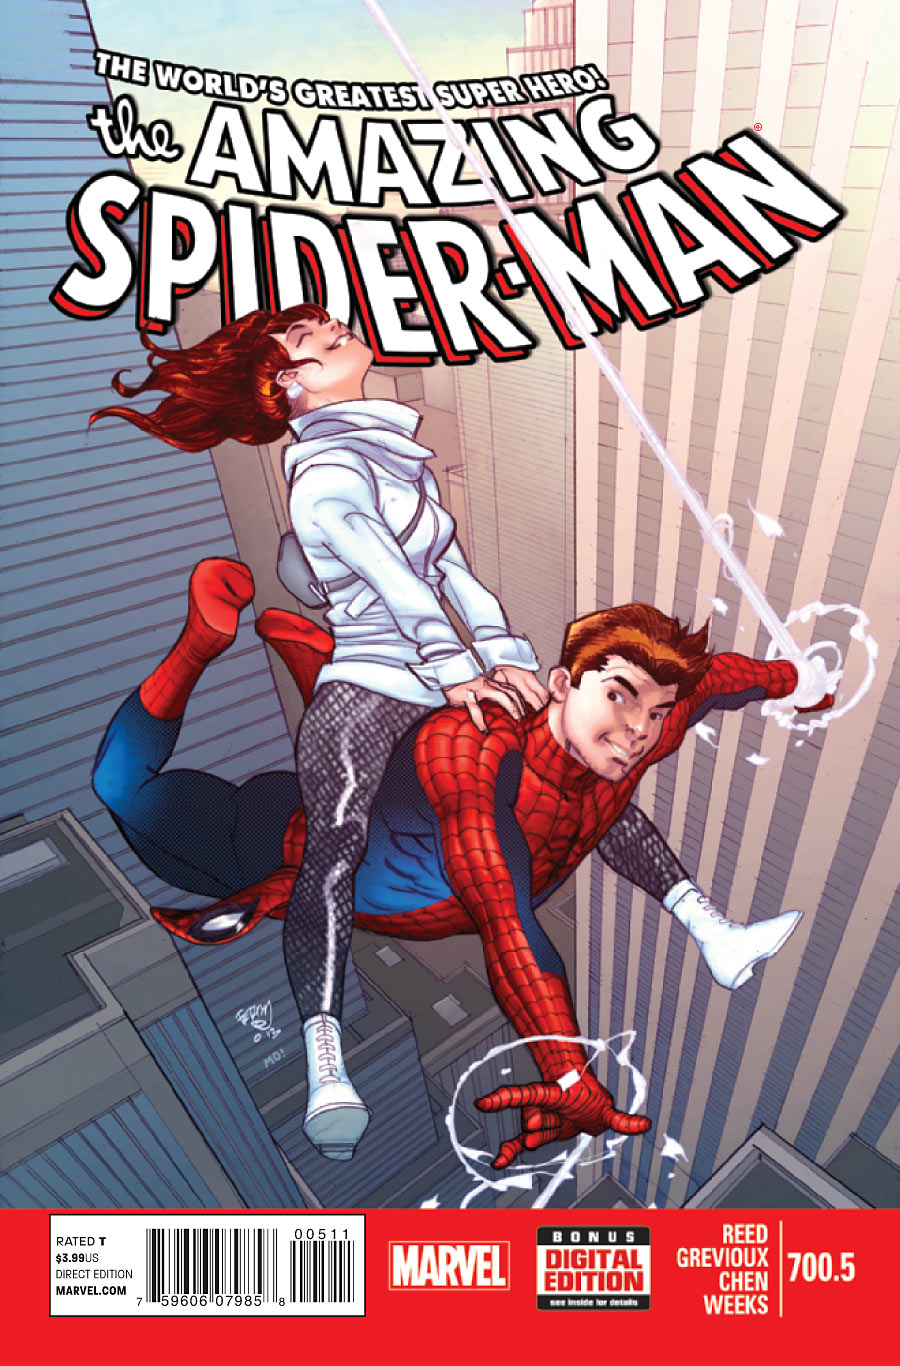 The Amazing Spider-Man #700.5